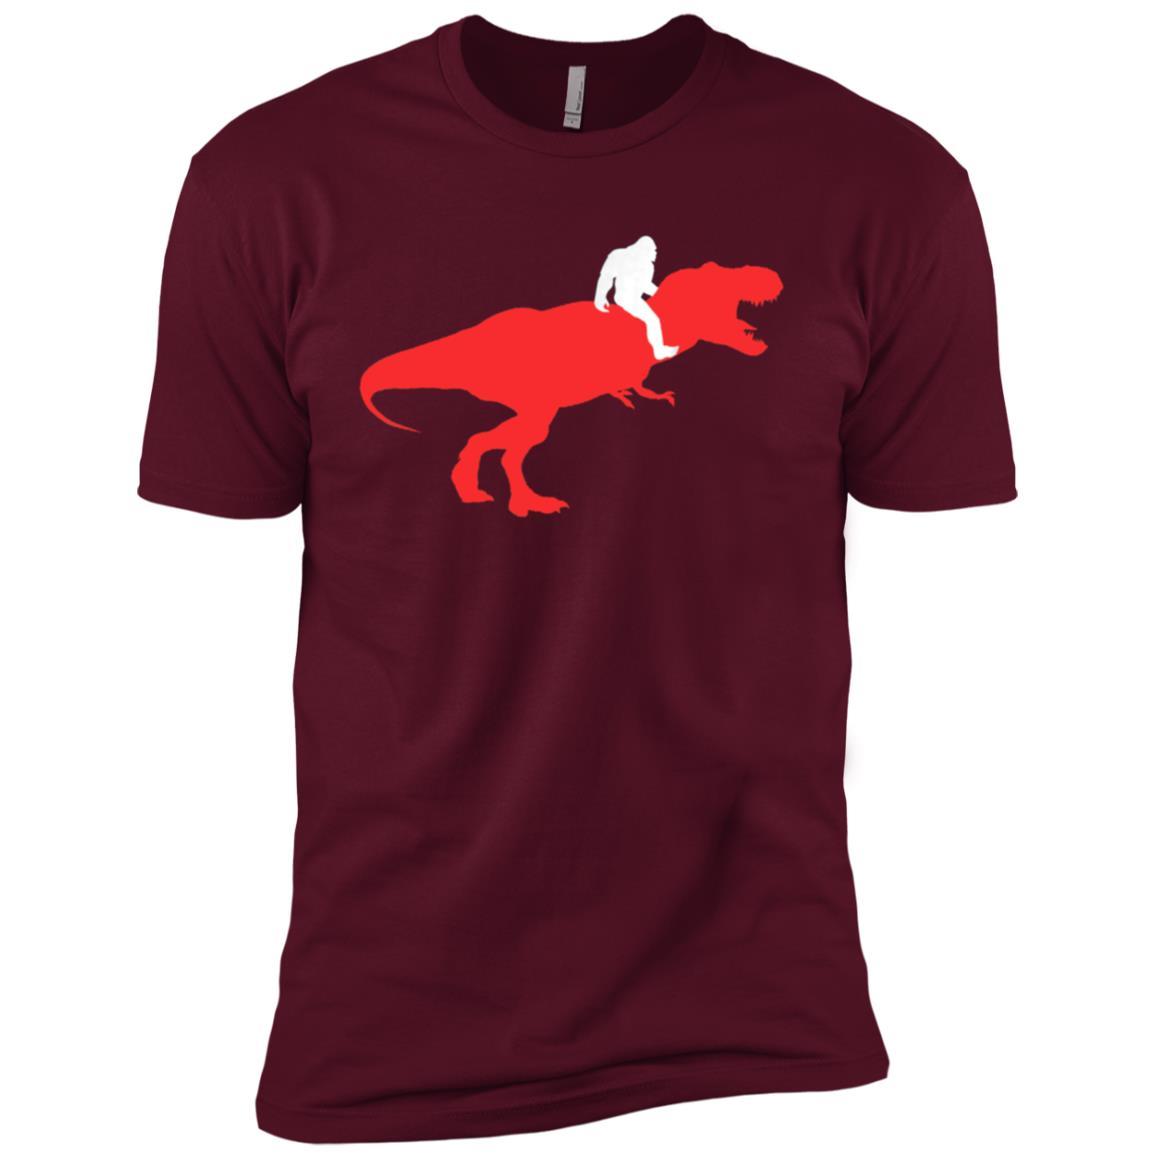 Bigfoot Riding Loch Ness Monster, Monster Hunter Men Short Sleeve T-Shirt